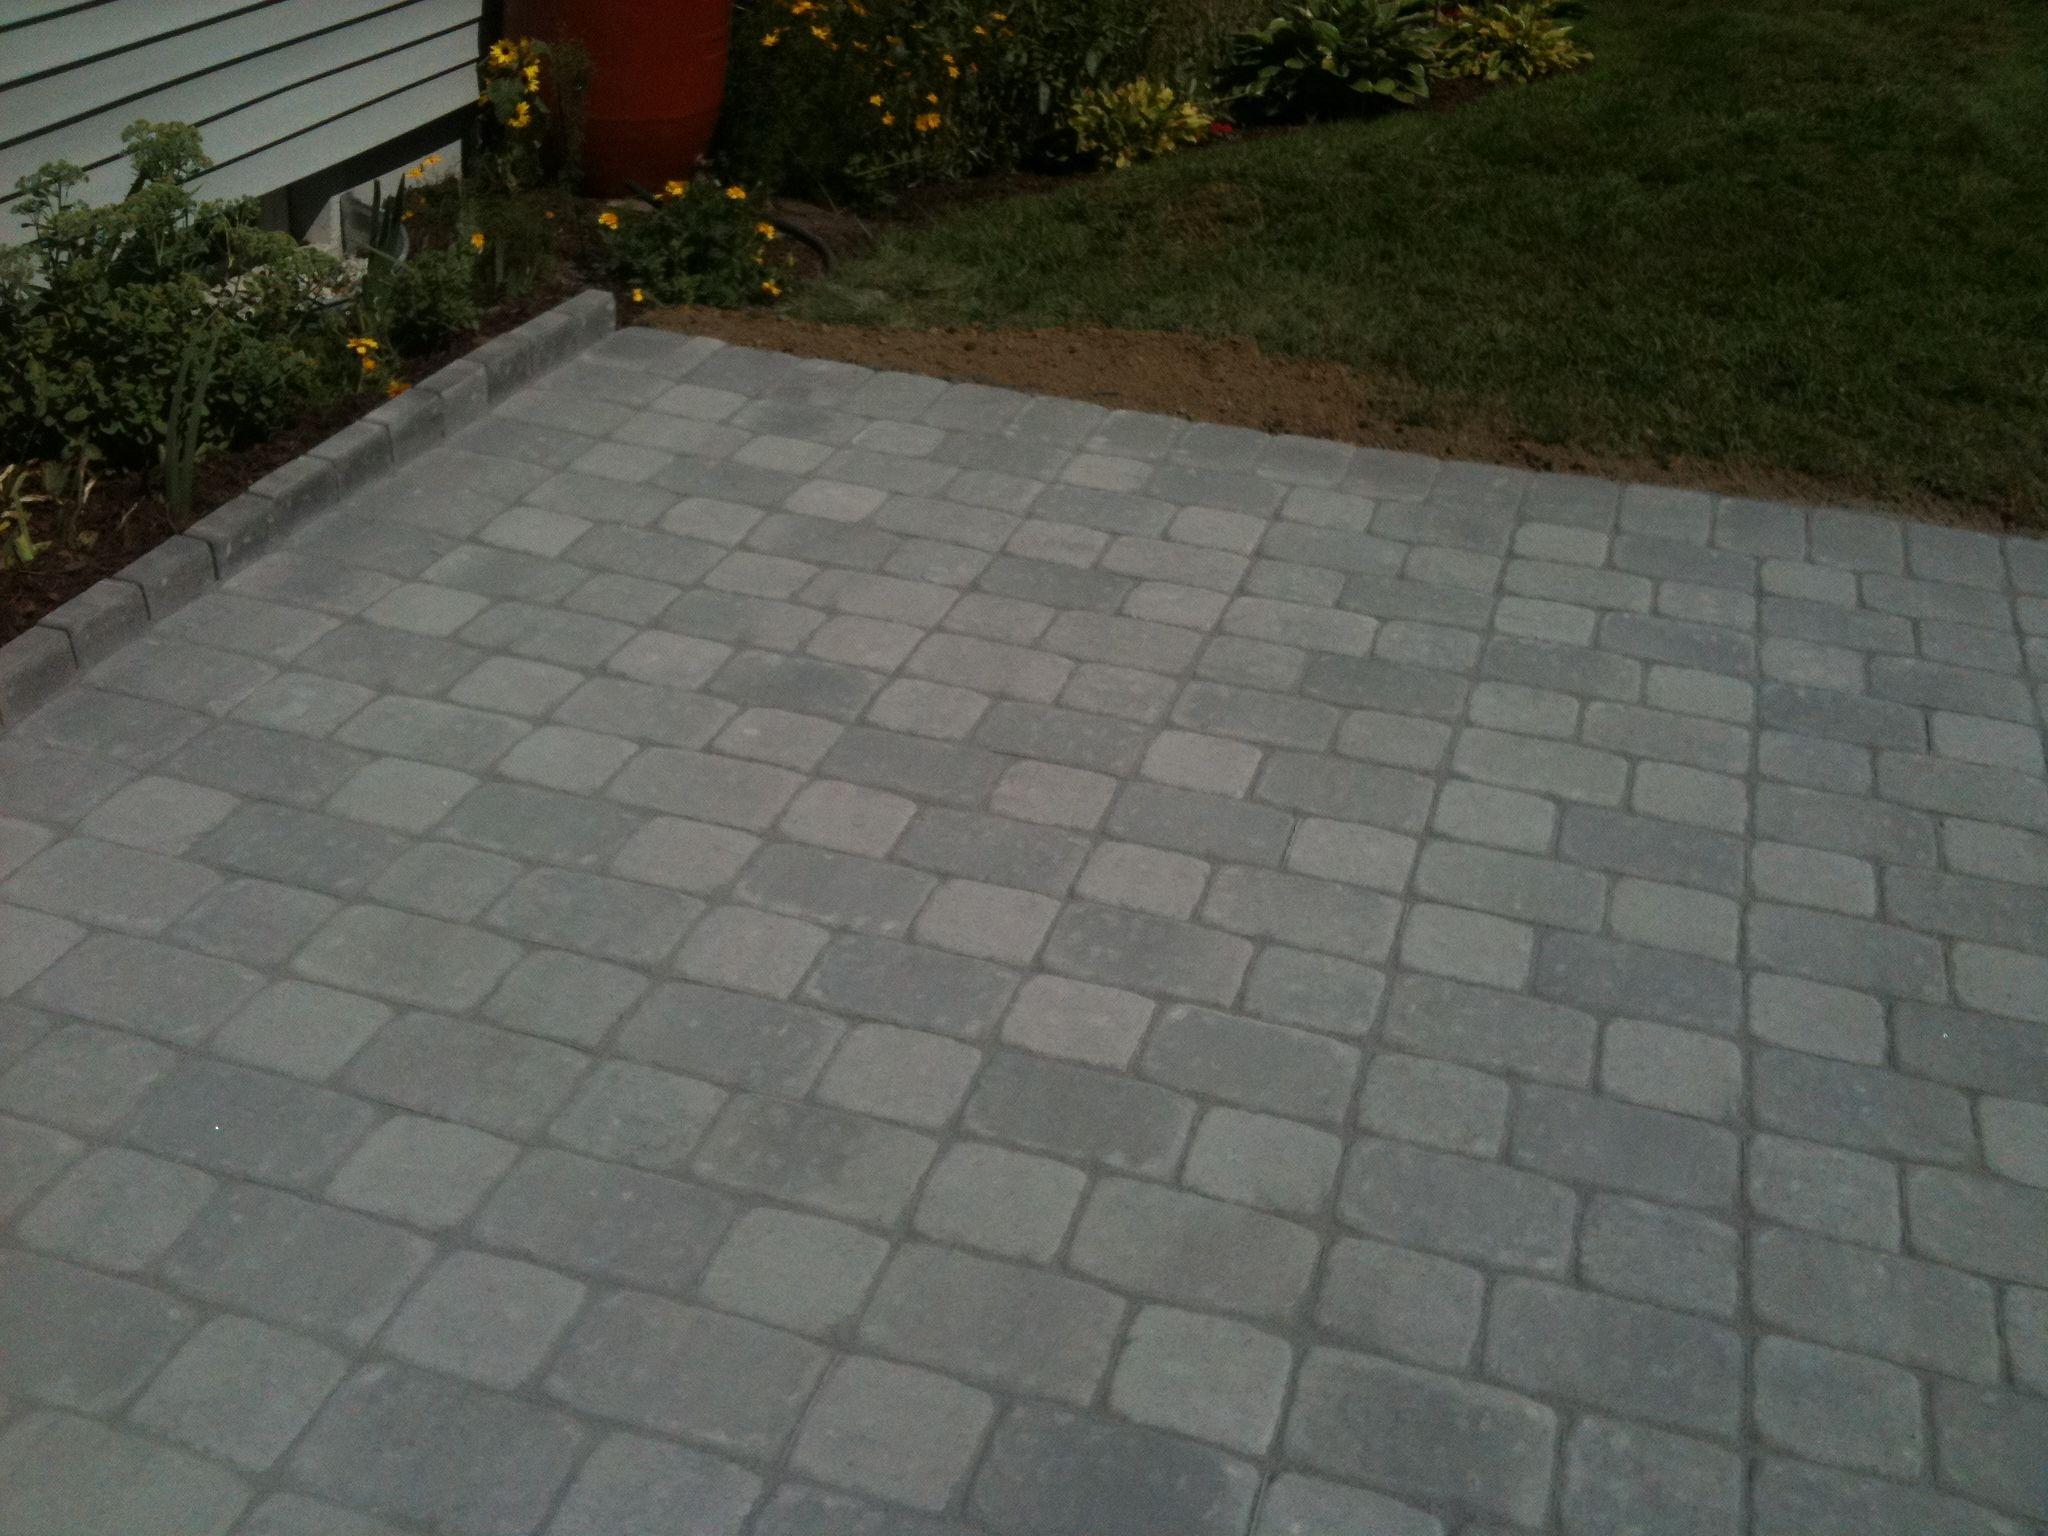 Unilock Camelot Patio In Granite Blend X X Pavers - Granite patio pavers